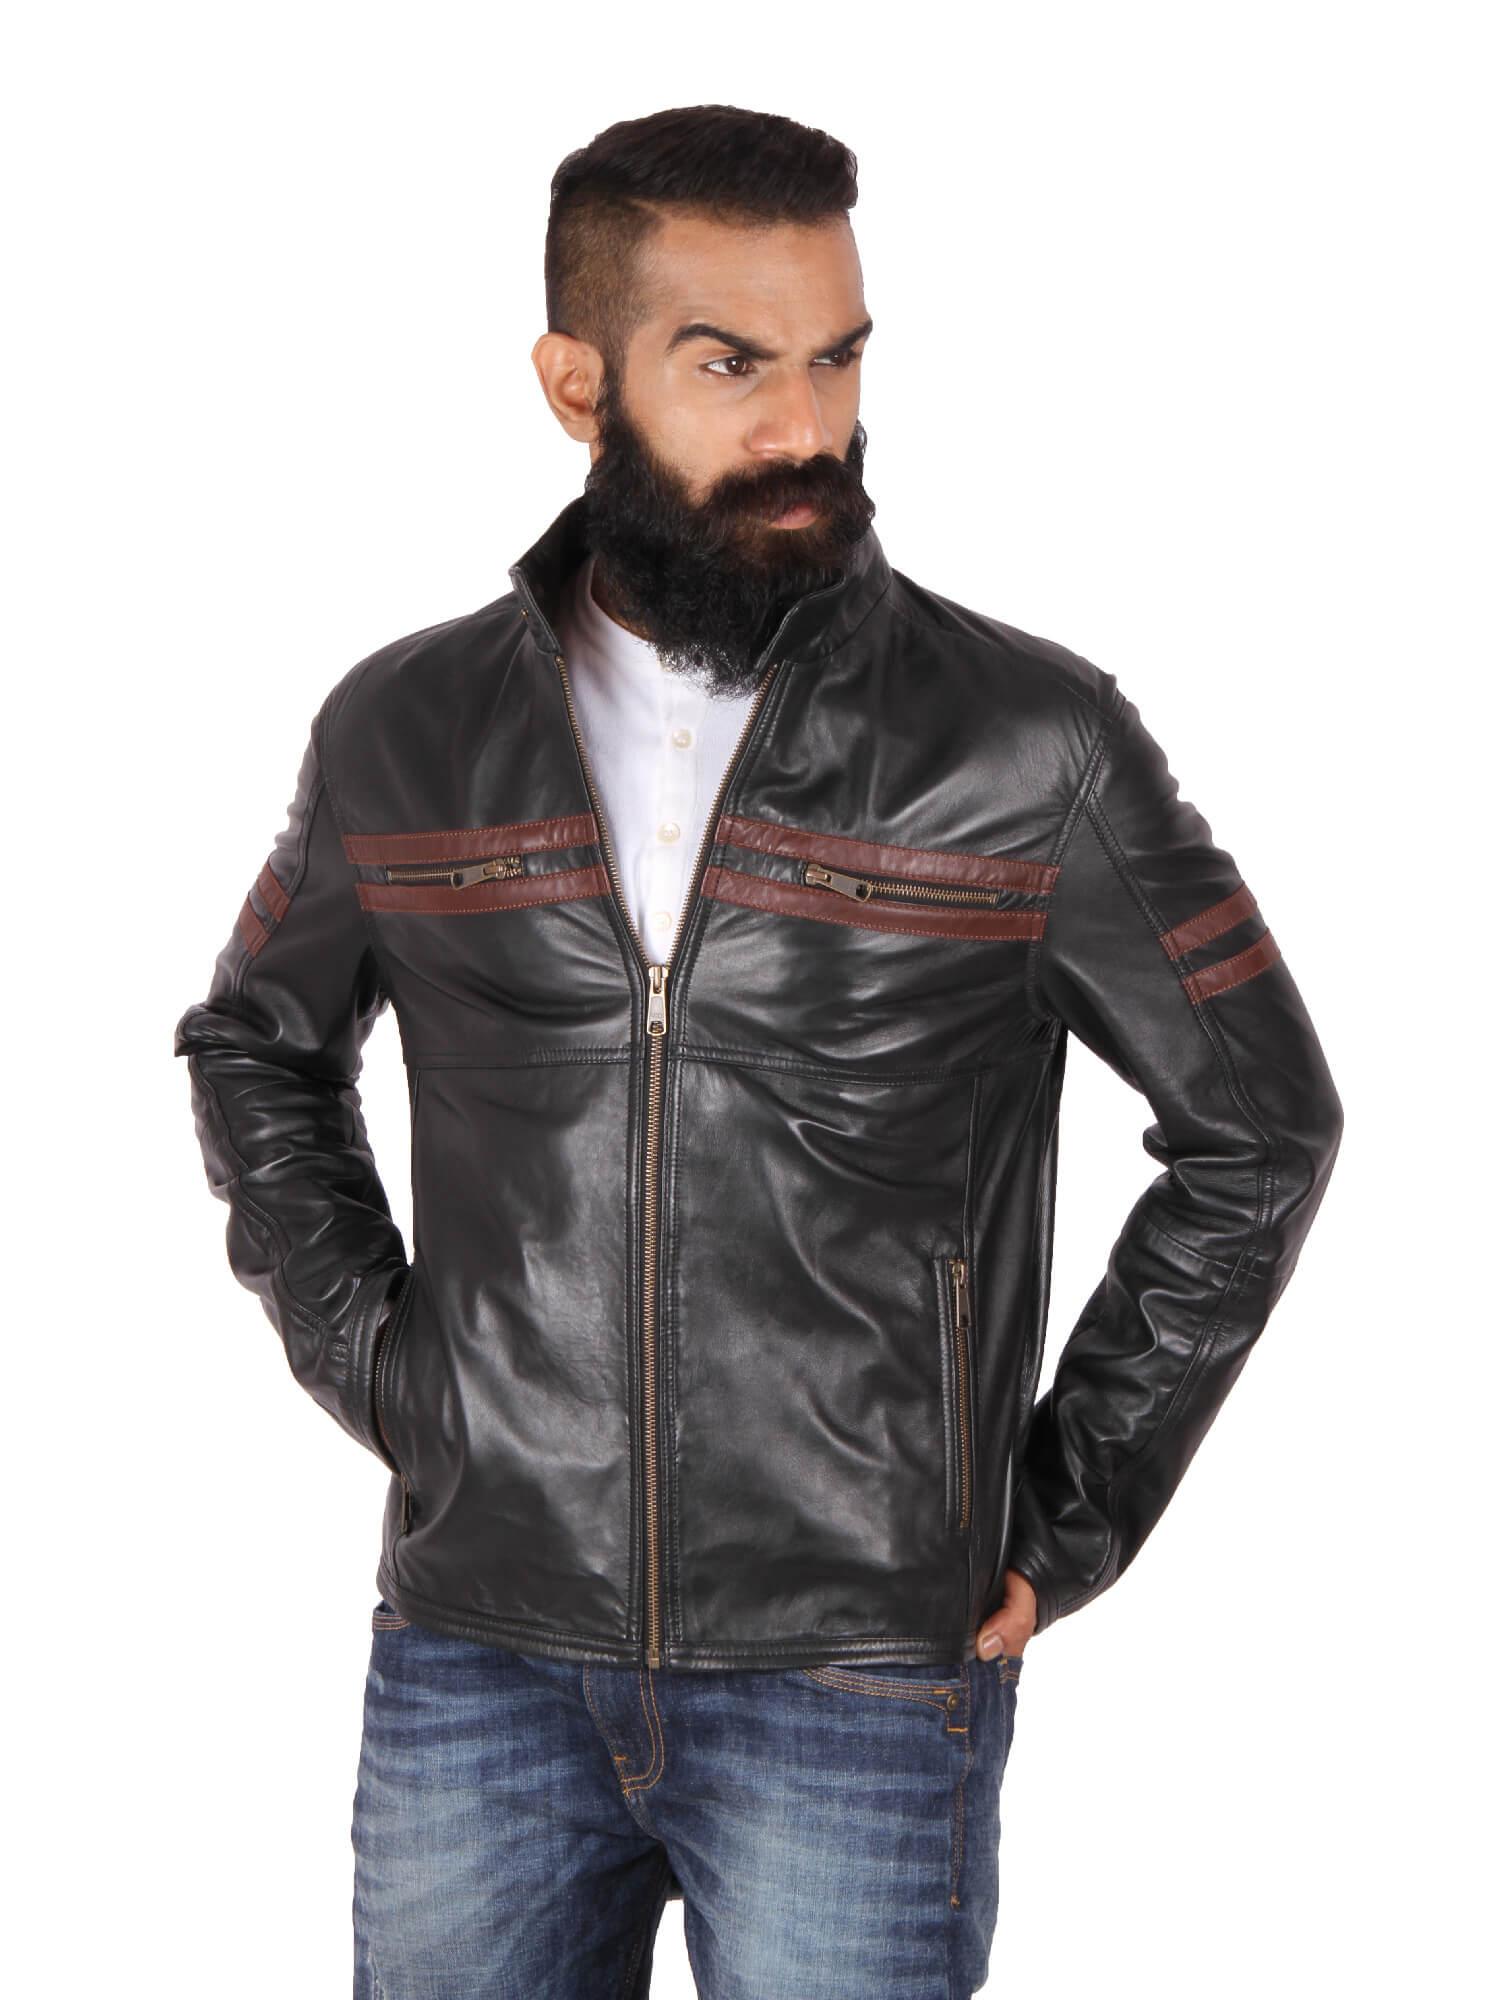 creambeige products jacket the rugged ladiesrifleman front rifleman sts beige rug ranchwear ladies cream leather